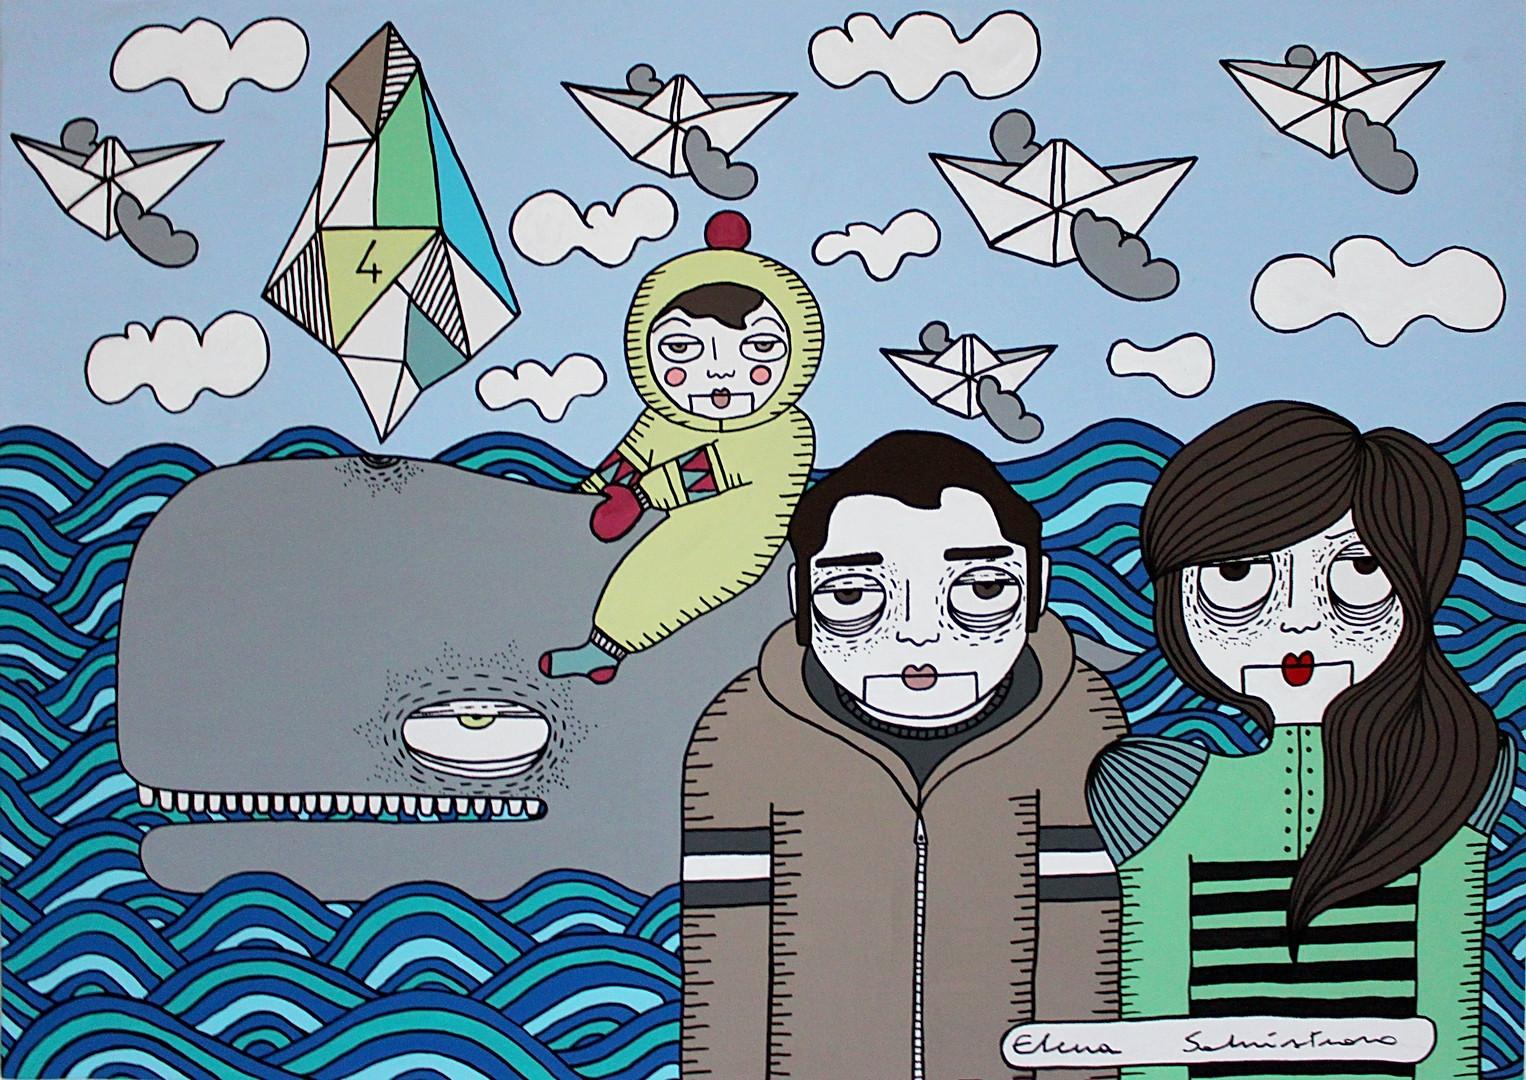 viaggio onirico nell'oceano - oniric tra